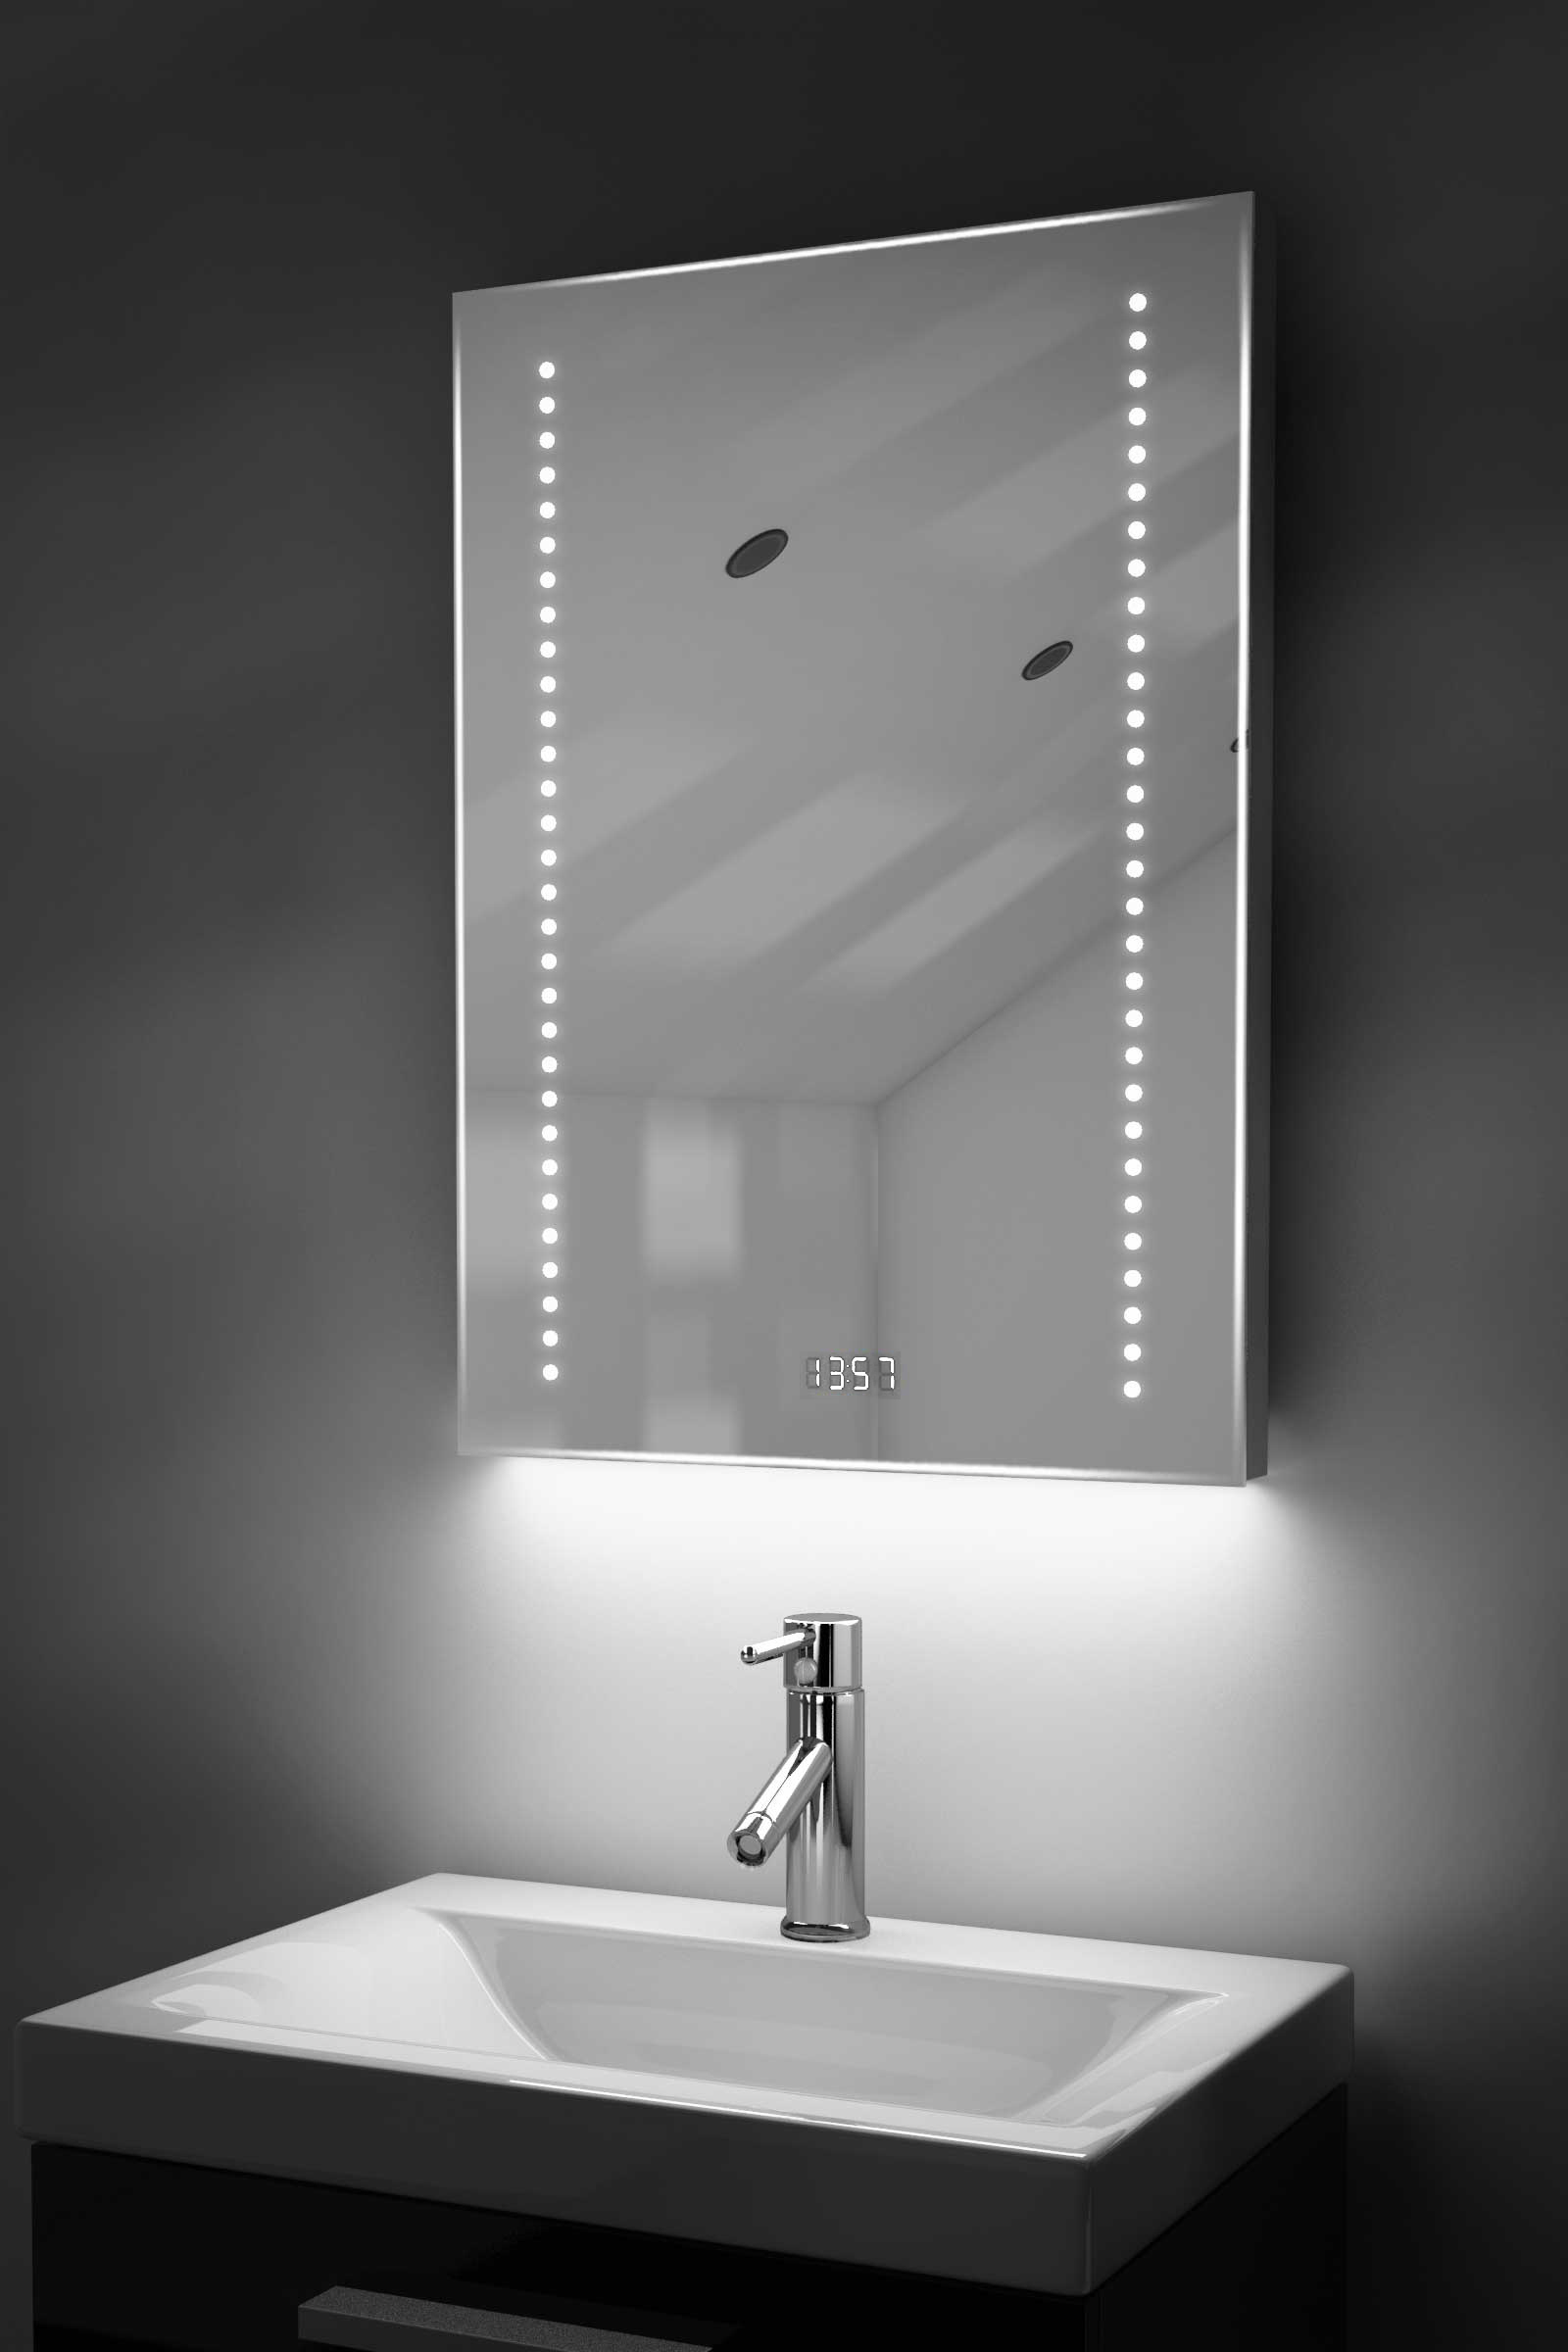 Digital Clock Slim Bathroom Mirror With Rgb Lighting Demist Sensor K184rgb Ebay